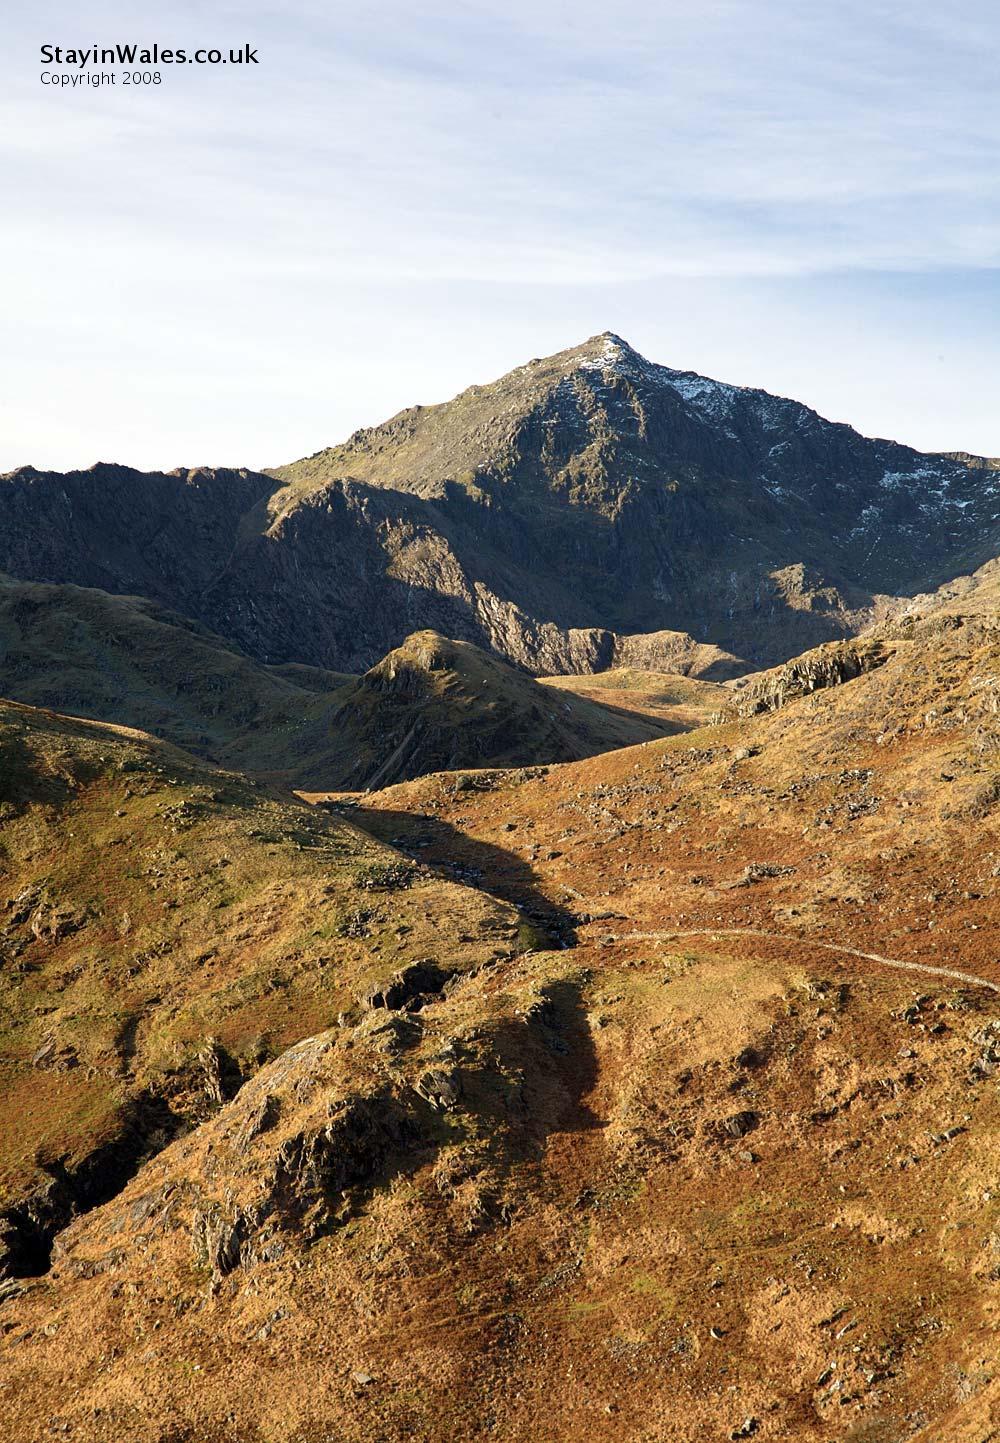 The Snowdon massif